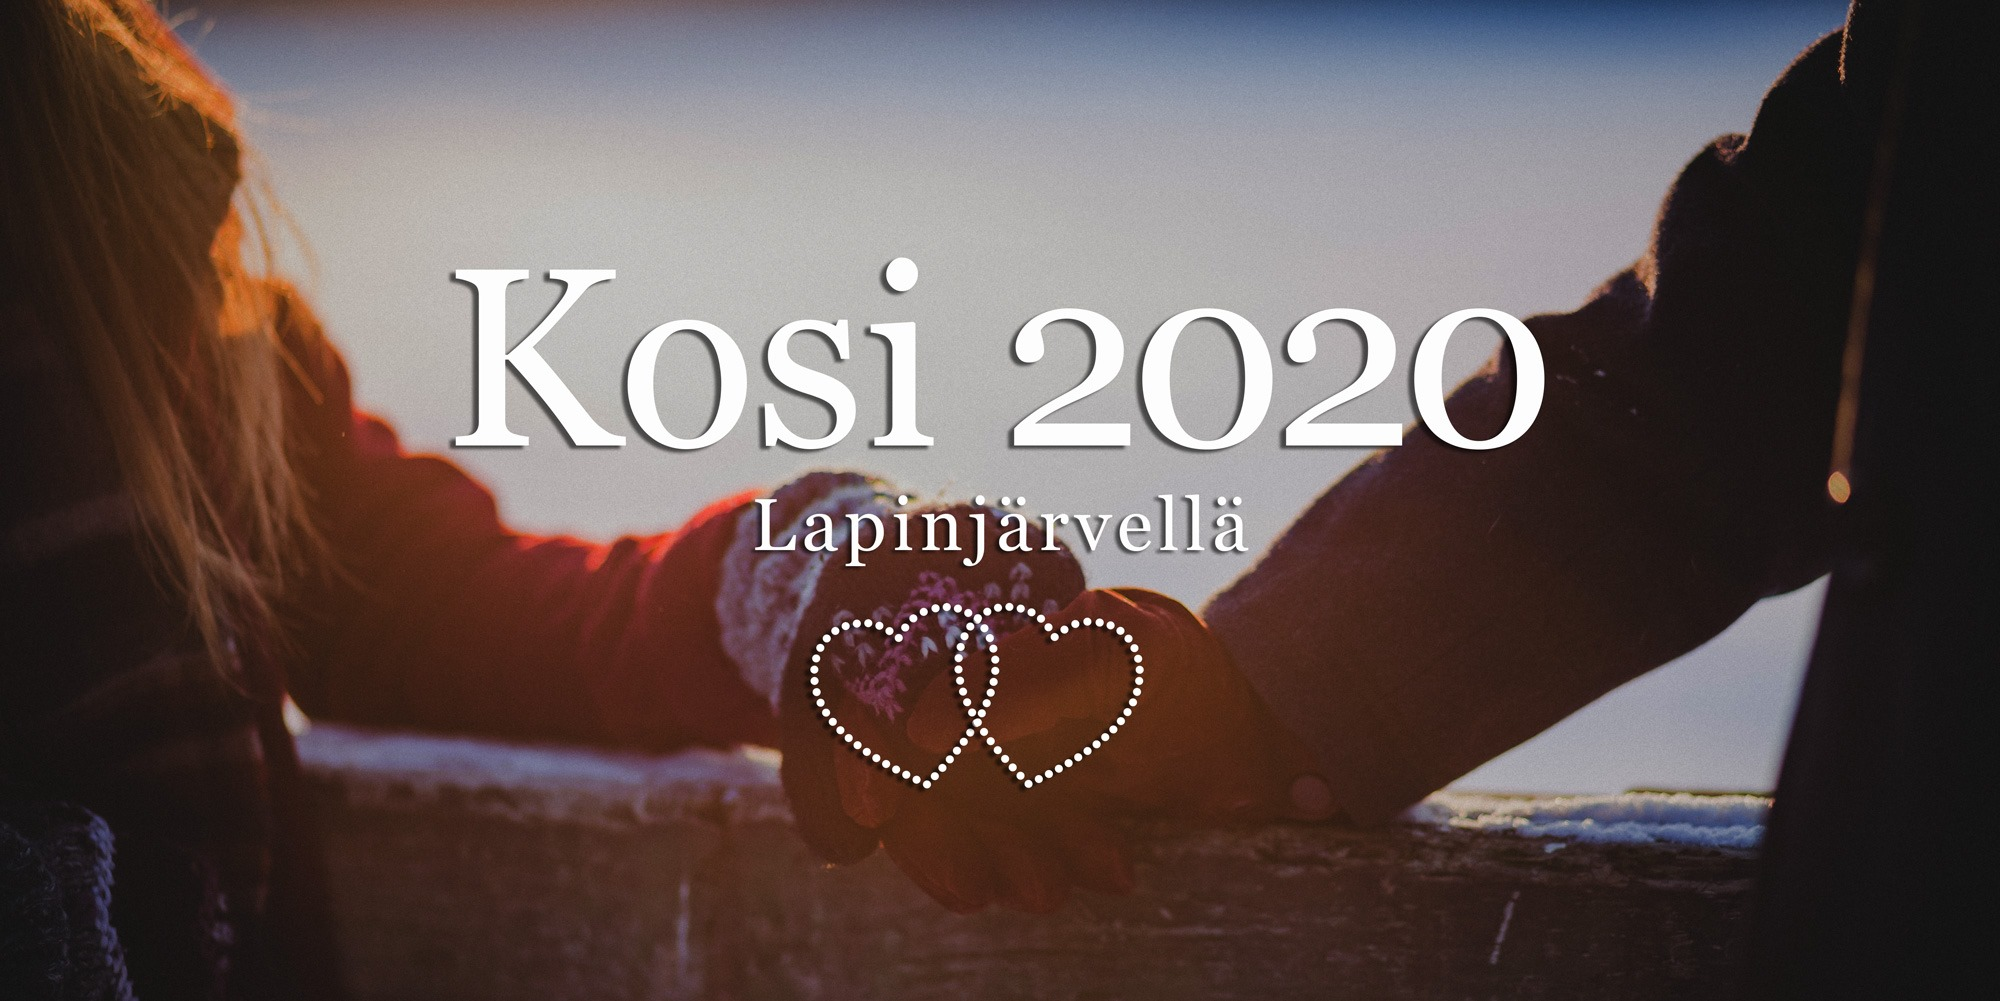 kosi2020-banneri.jpg